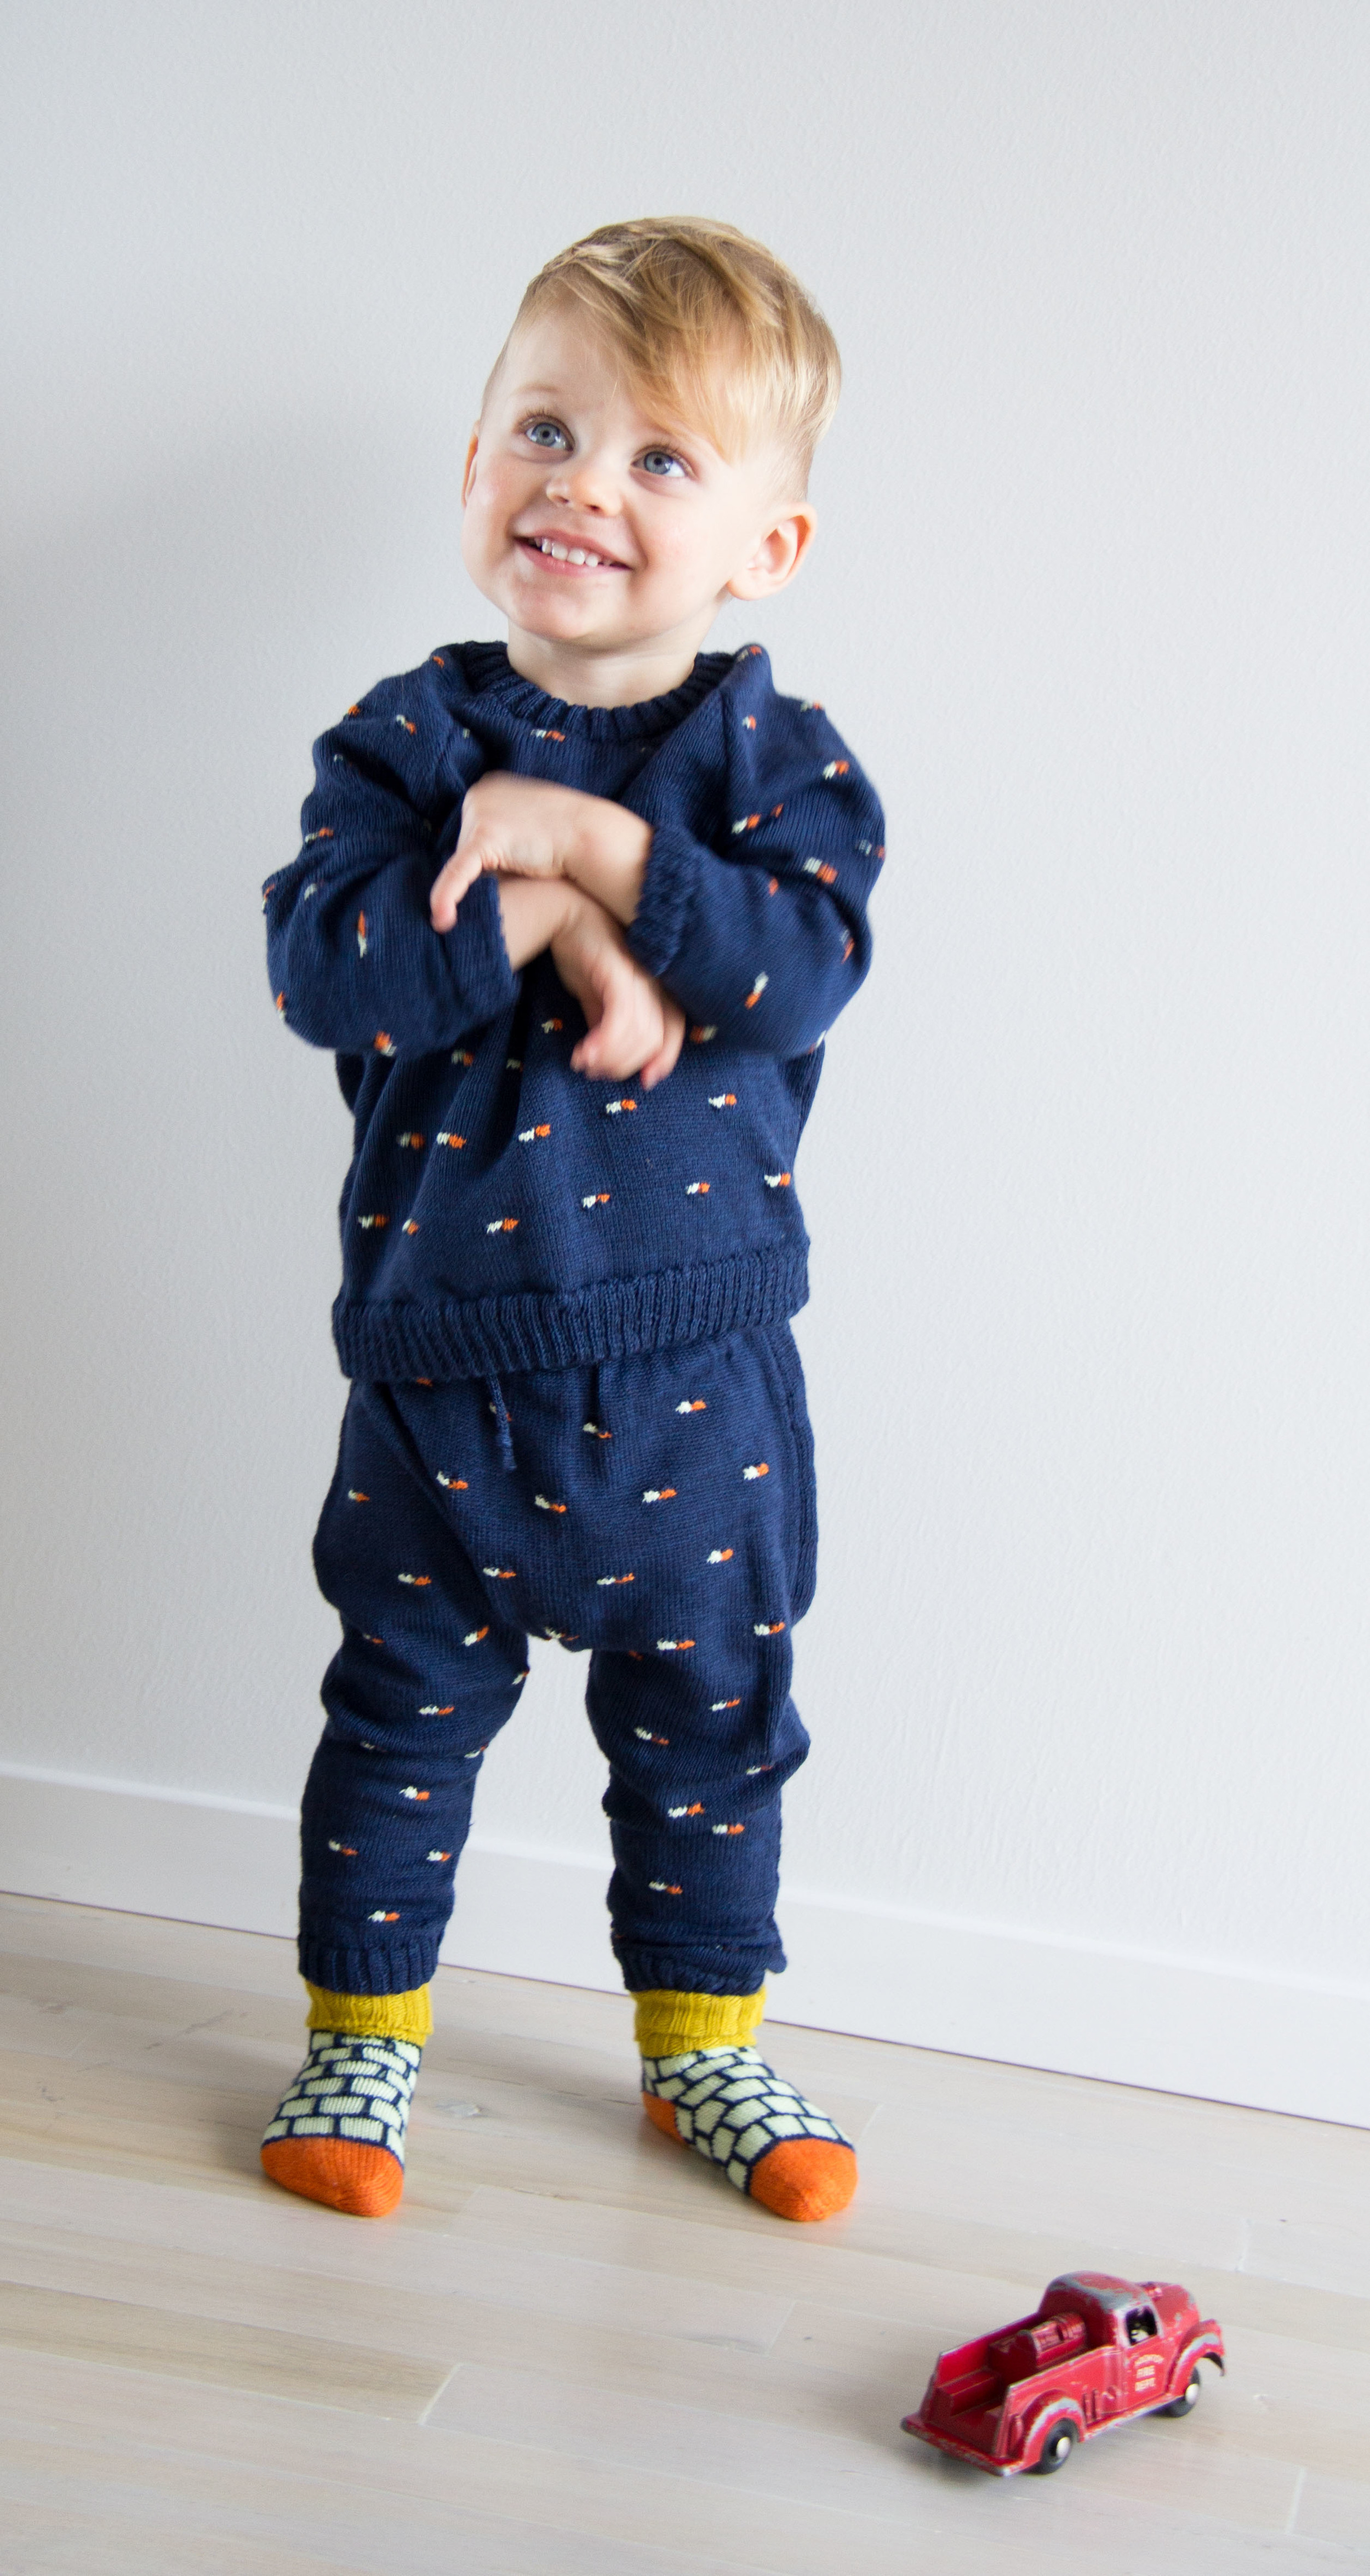 babyDEGEN   Pillz Sweater  |  Pillz Pants  |  Blocky Socks